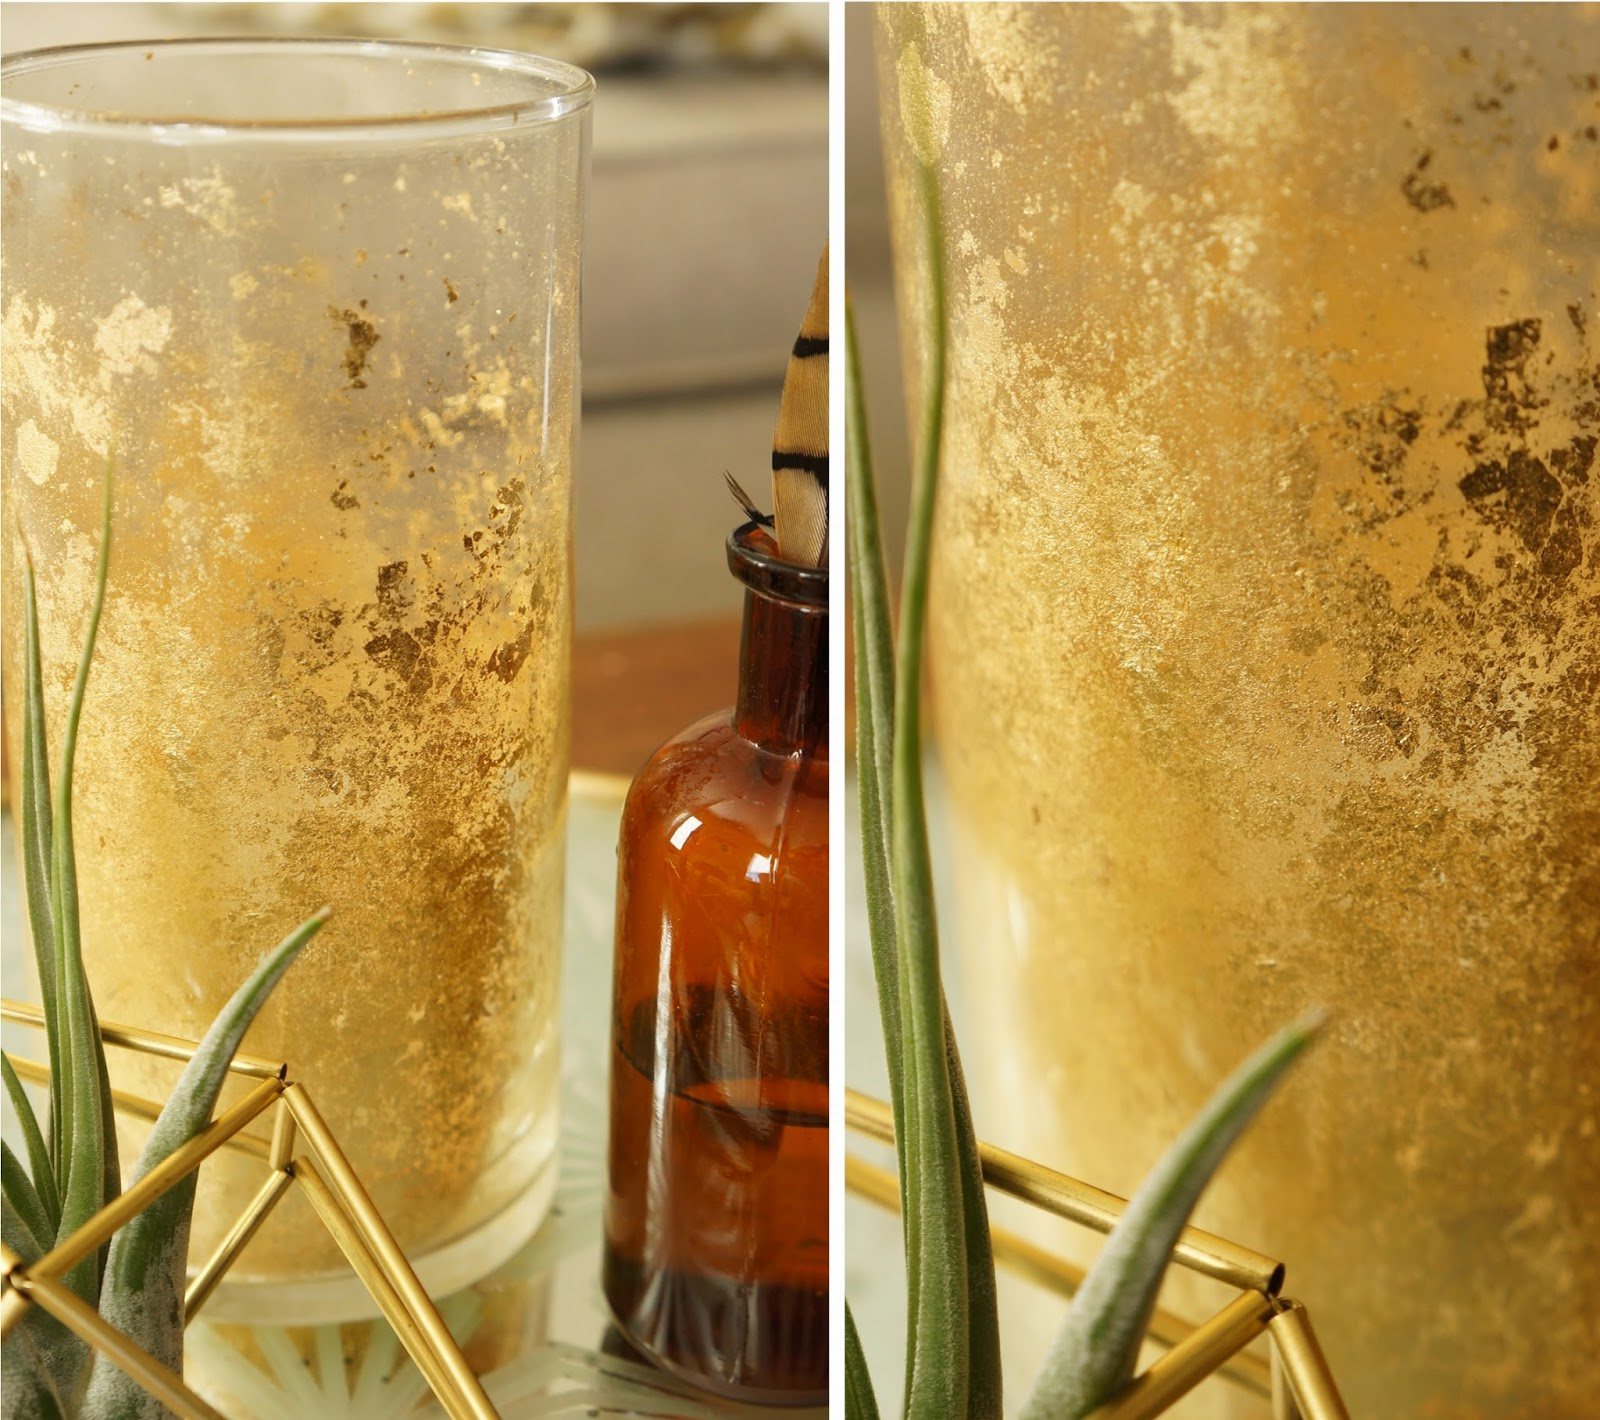 Diy gold mercury vase harvesting love events materials reviewsmspy